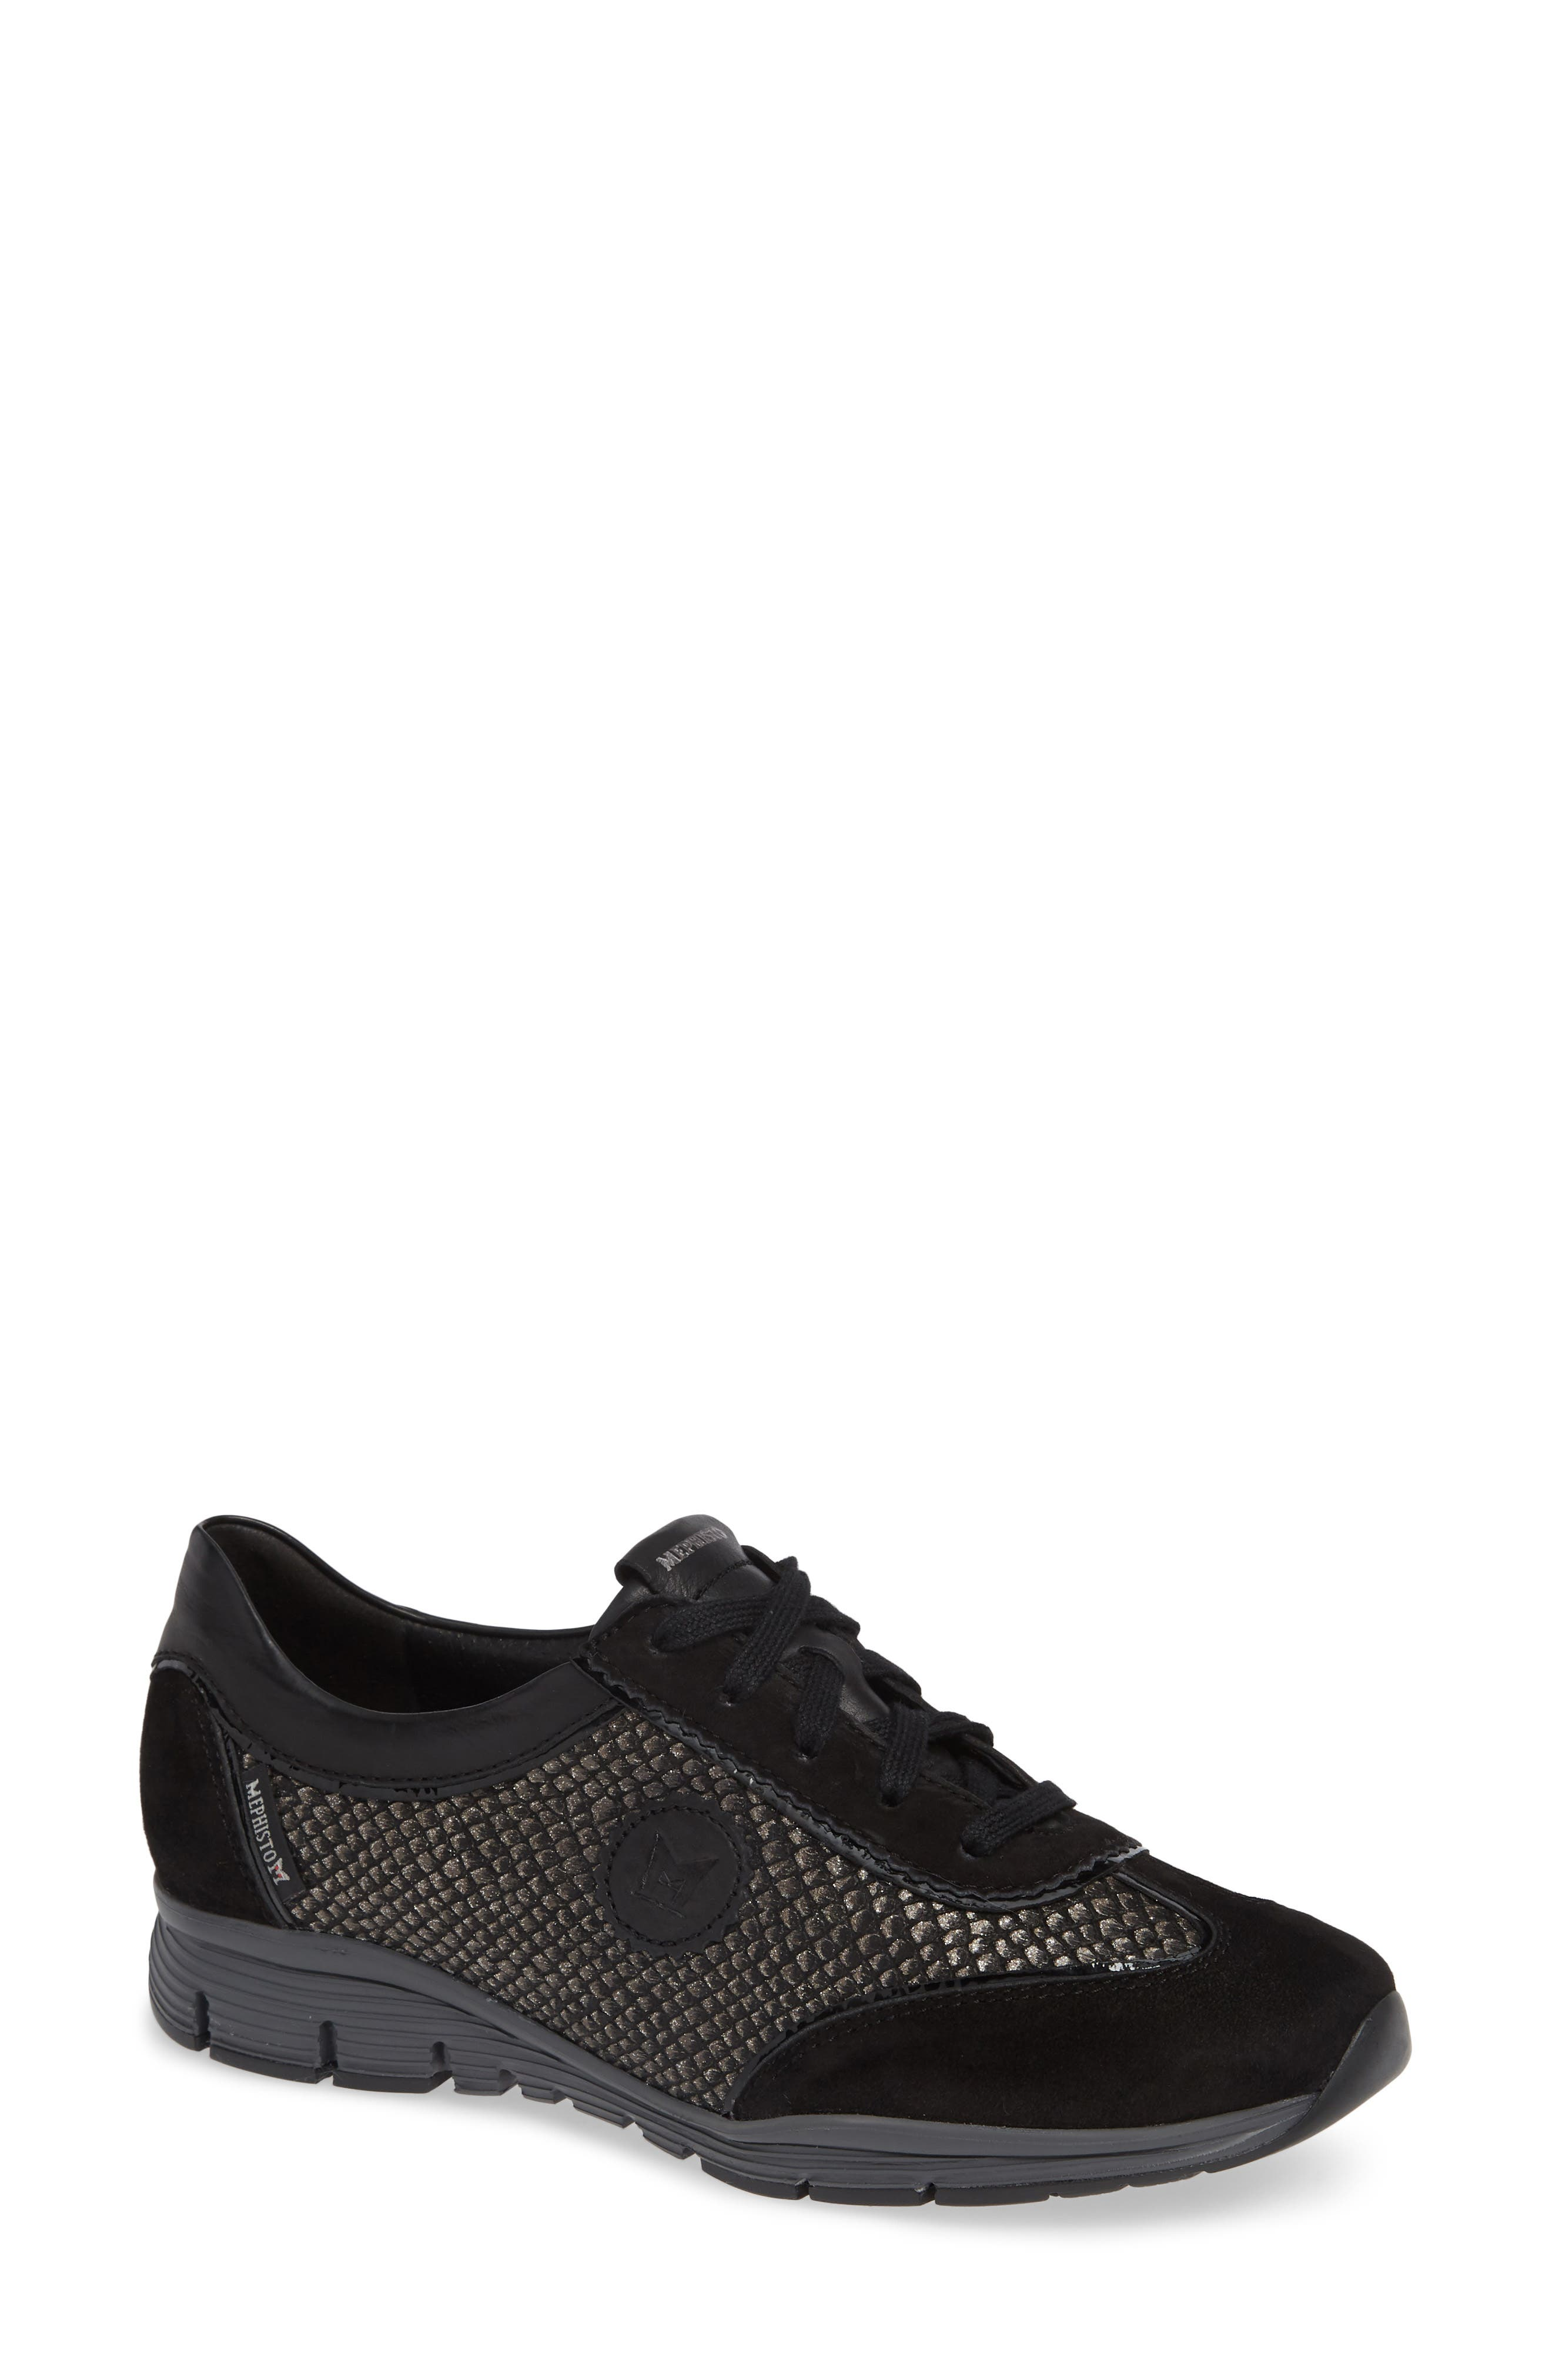 MEPHISTO 'Yael' Soft-Air Sneaker, Main, color, BLACK SUEDE